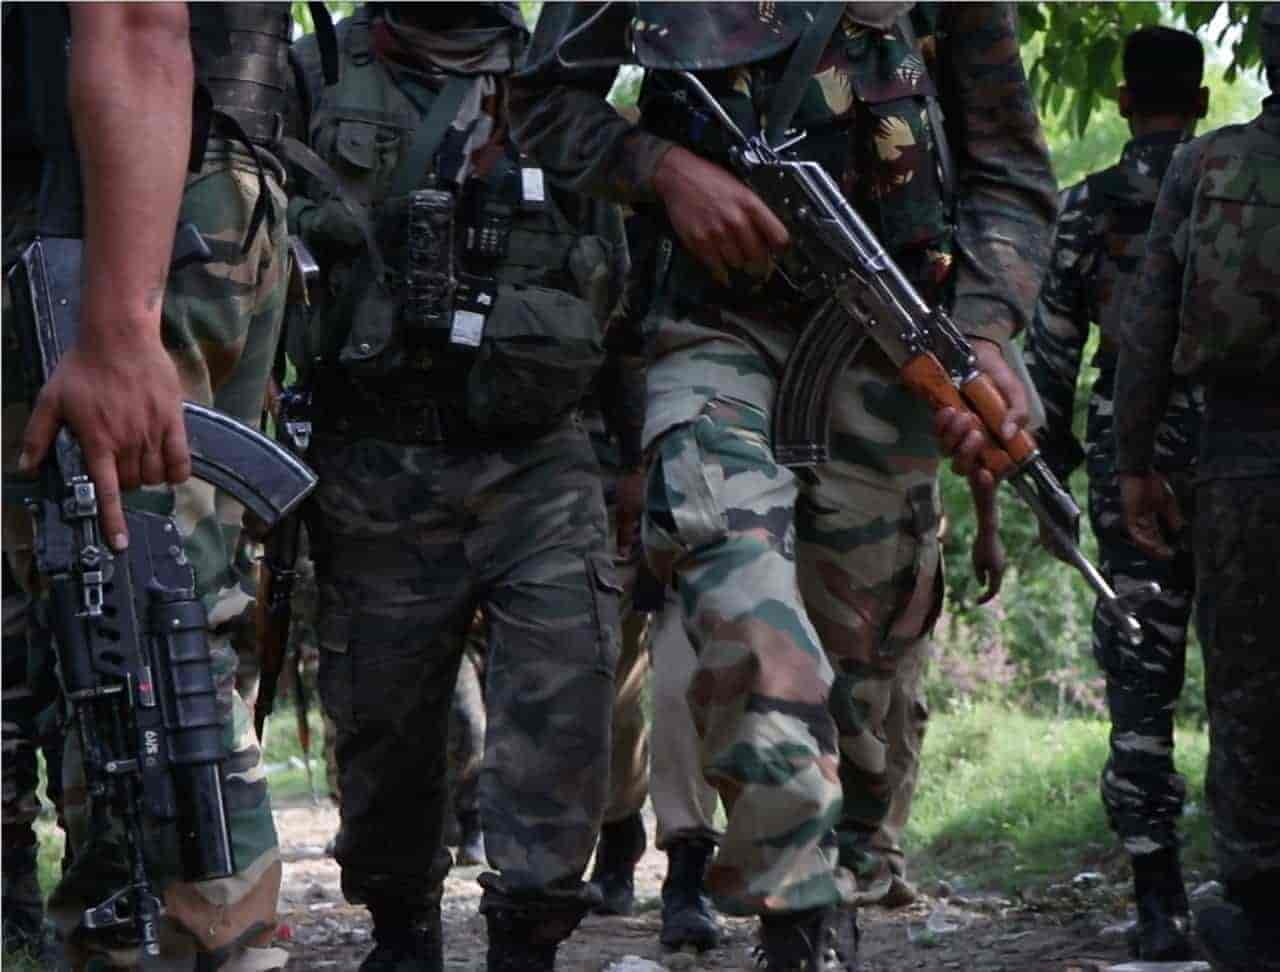 pulwama gunfight,tral gunfight, shootout, tehreek-ul-mujahidin